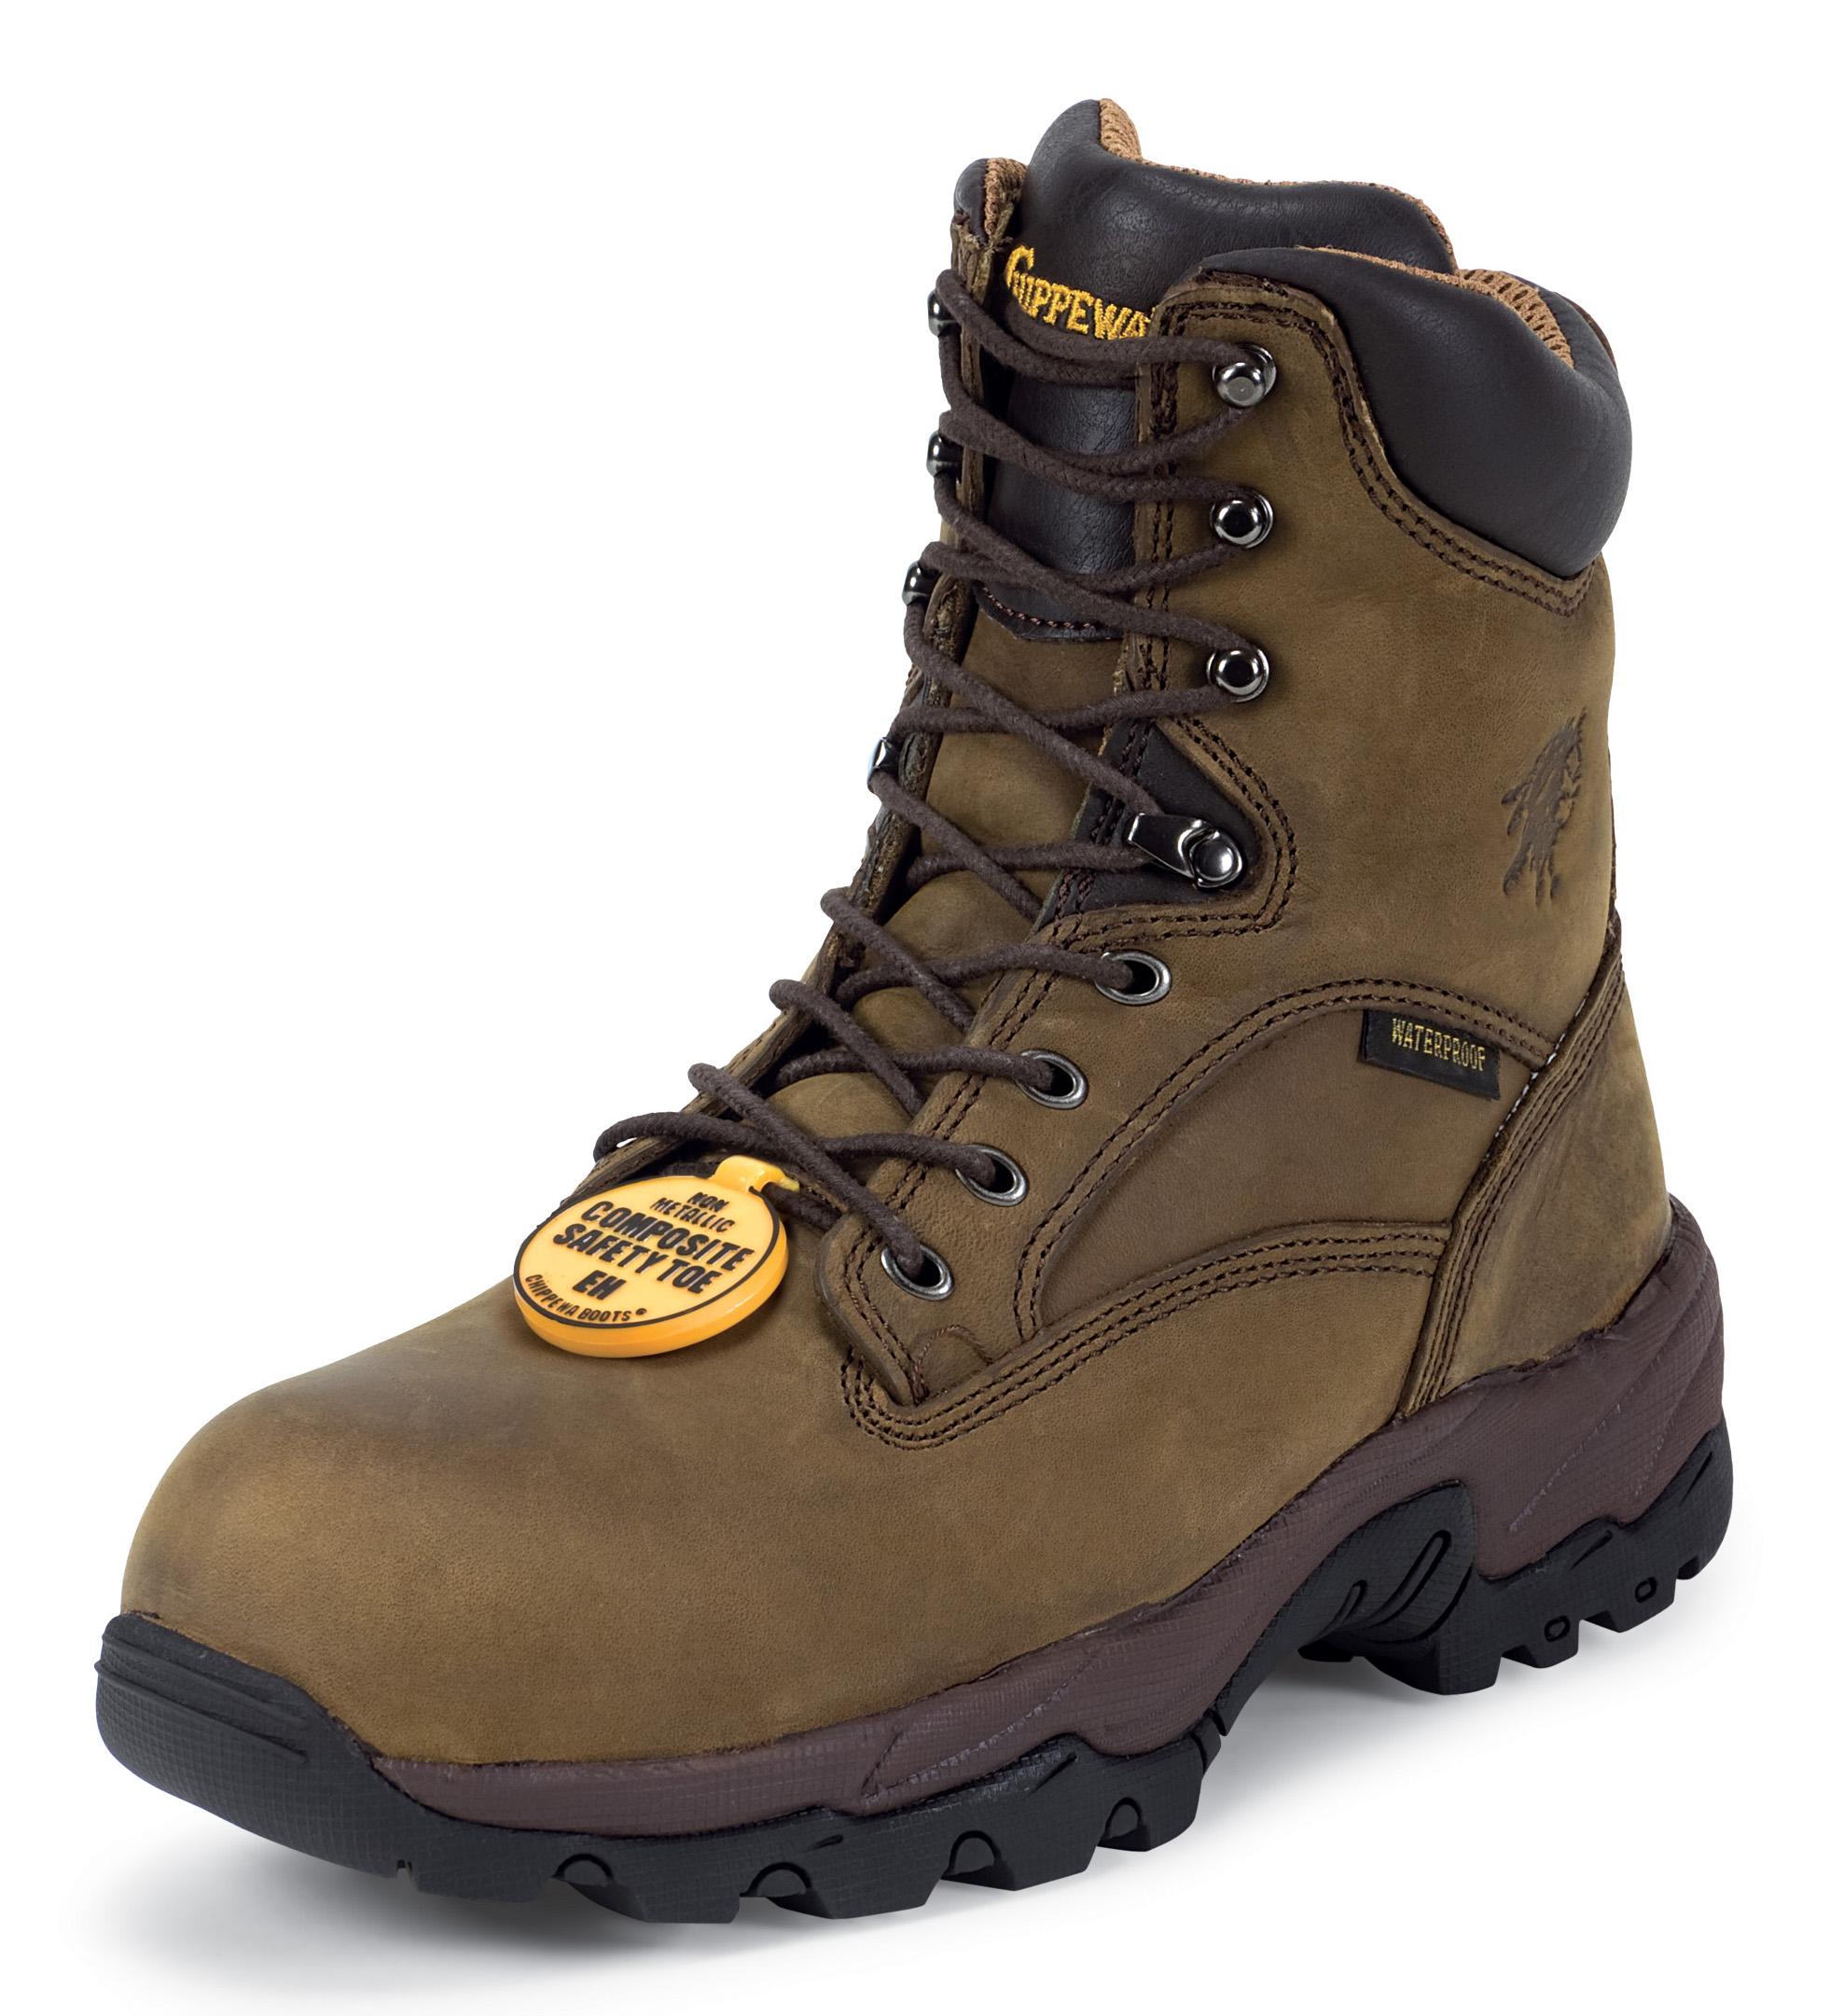 "Chippewa Men's 8"" Bay Apache Comp Toe Brown Nubuc Leather 55168 (D, M) at Sears.com"